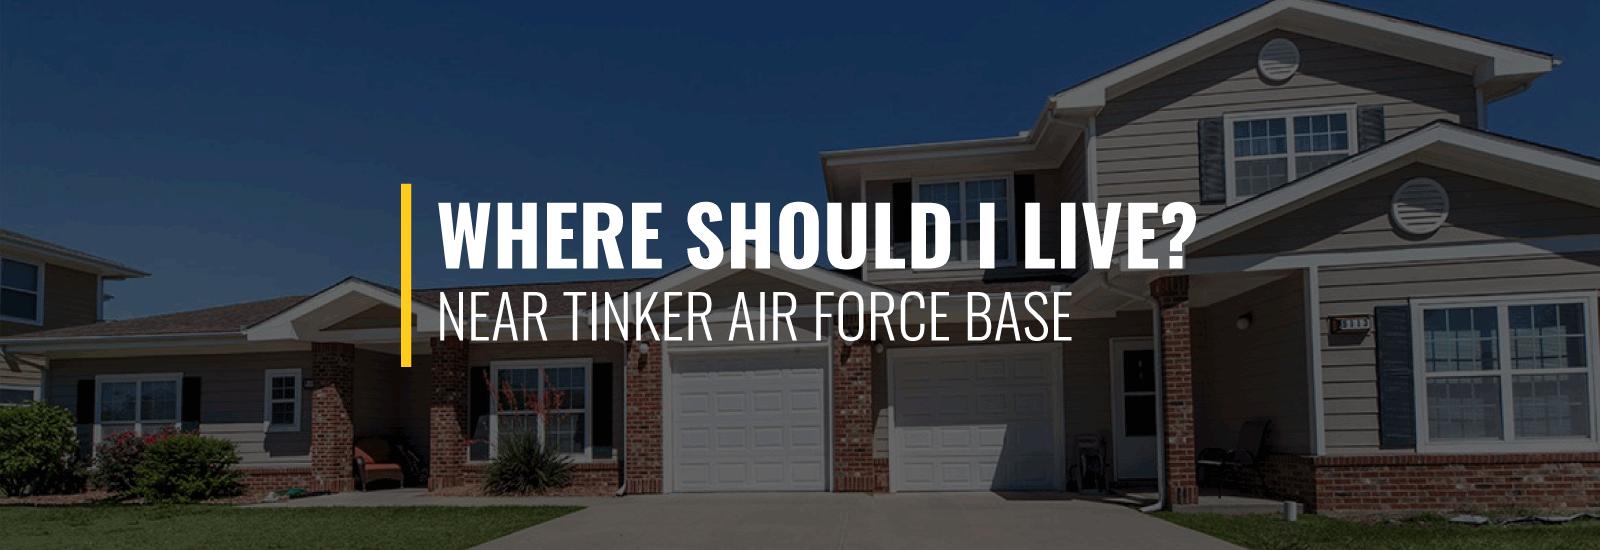 Where Should I Live Near Tinker Air Force Base?